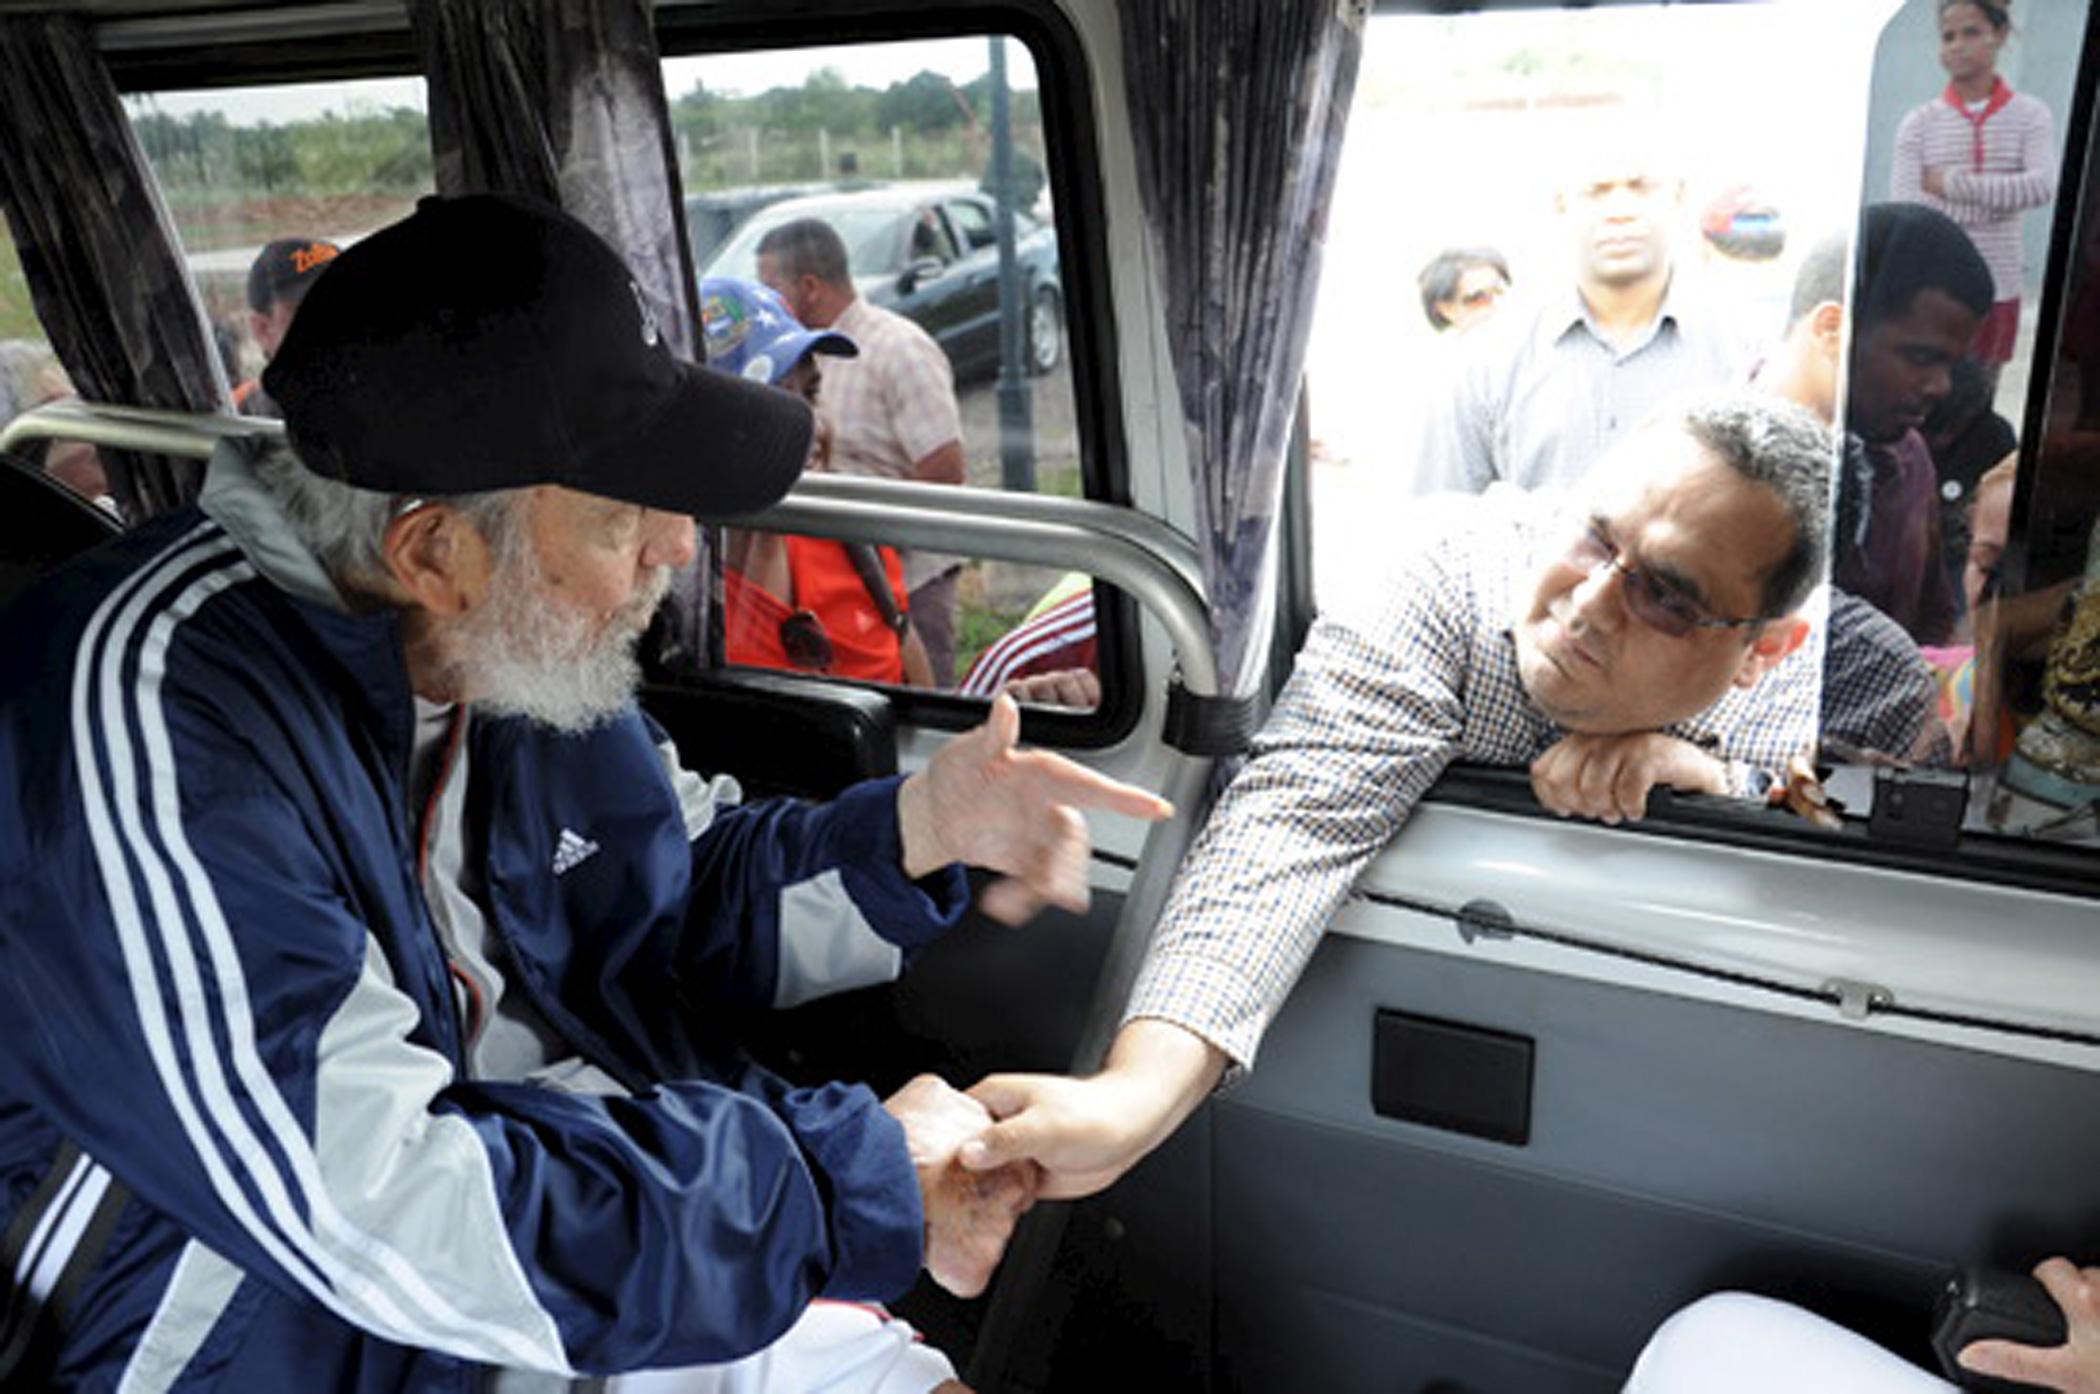 Former Cuban president Fidel Castro talks to a delegation of Venezuelans in Havana on March 30, 2015.